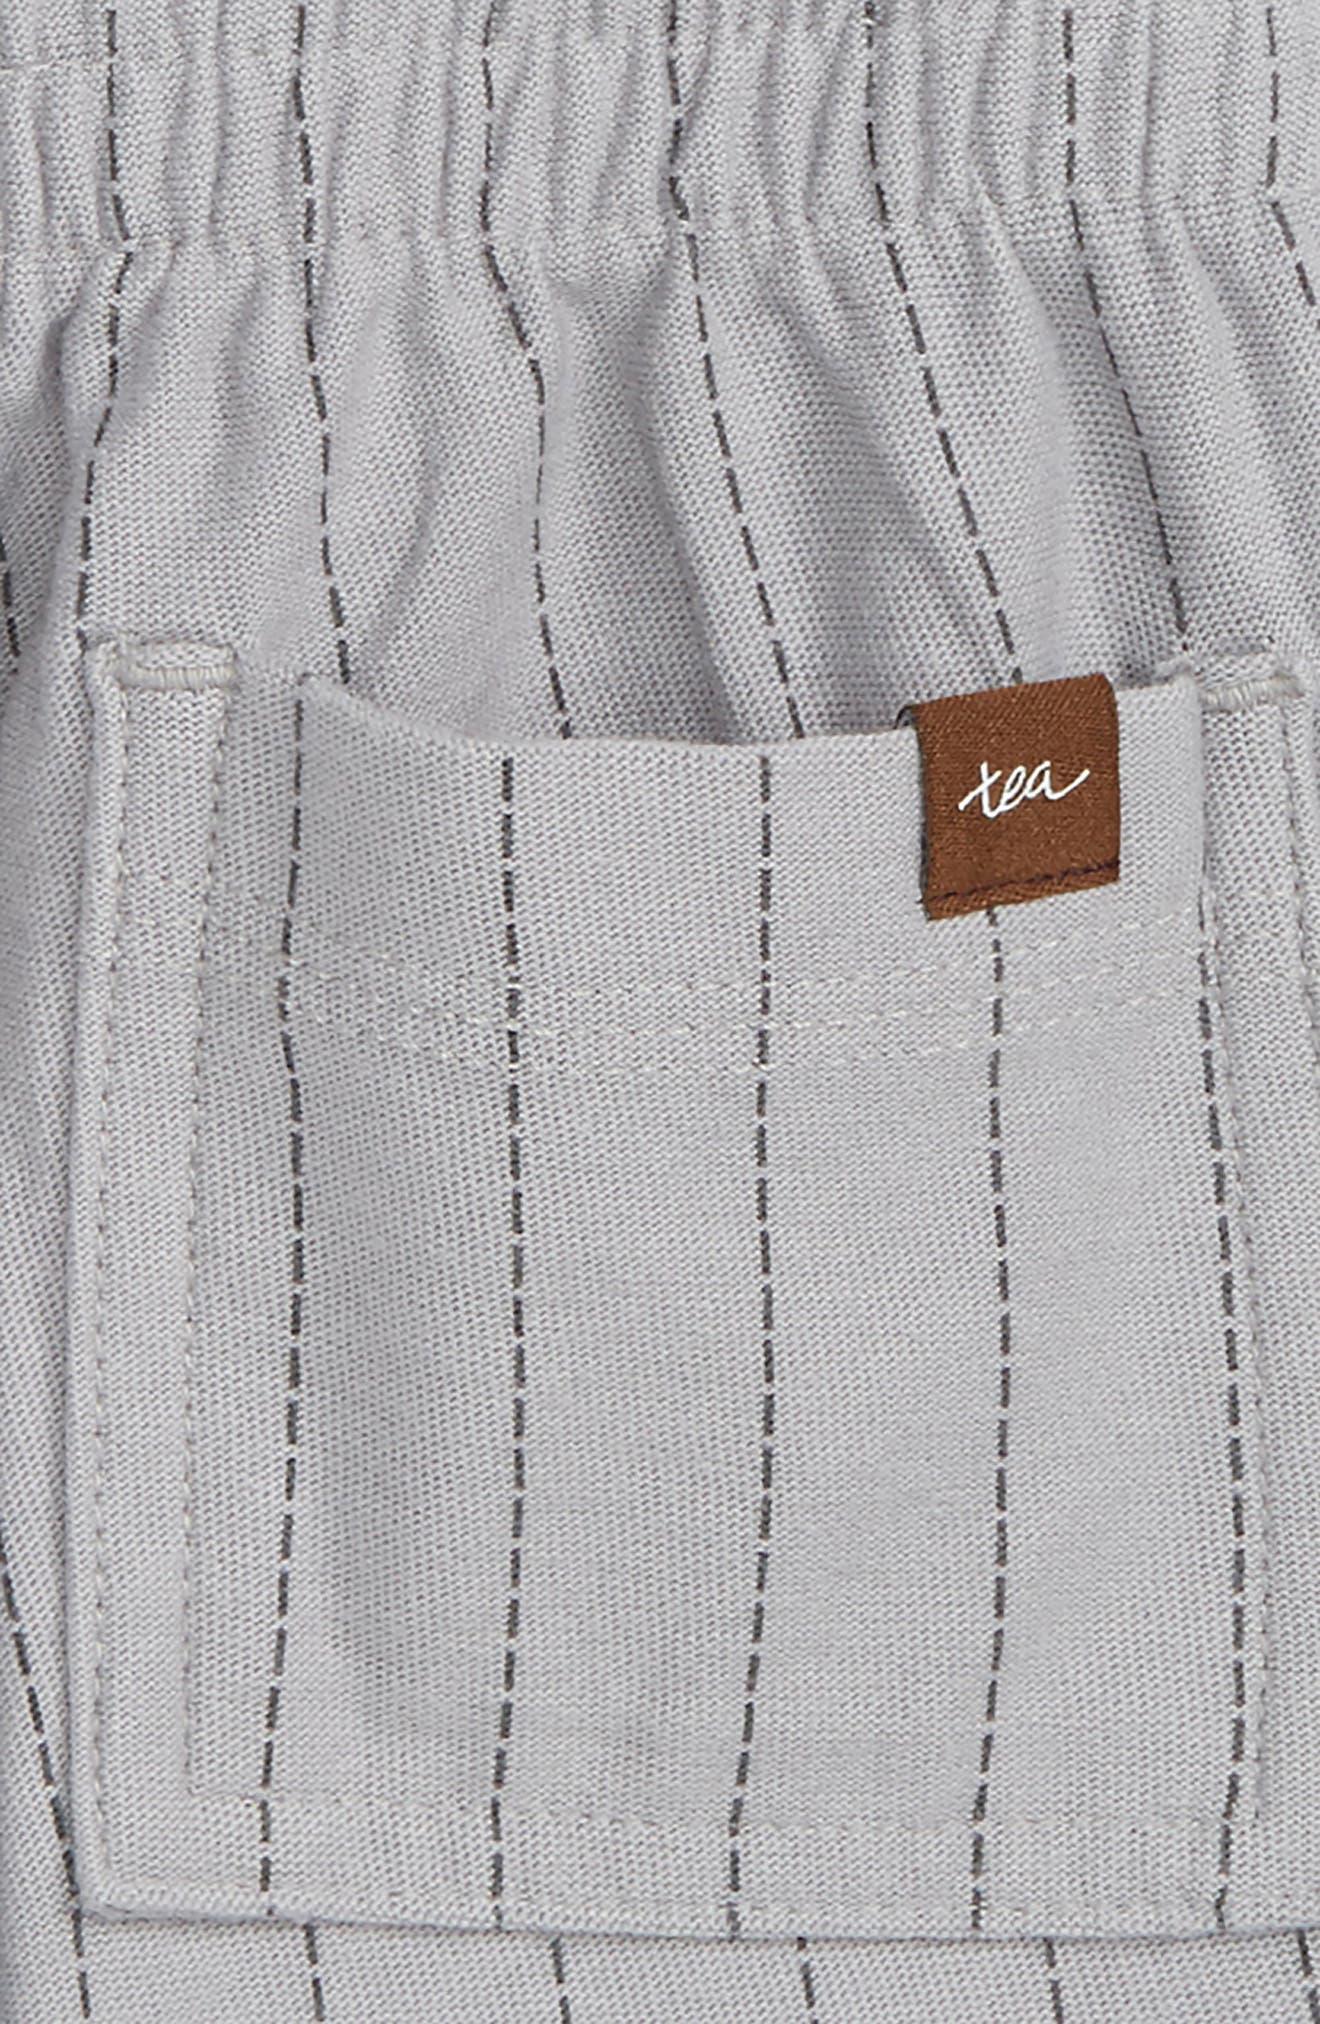 Stripe Shorts,                             Alternate thumbnail 3, color,                             Storm Grey Ticking Stripe